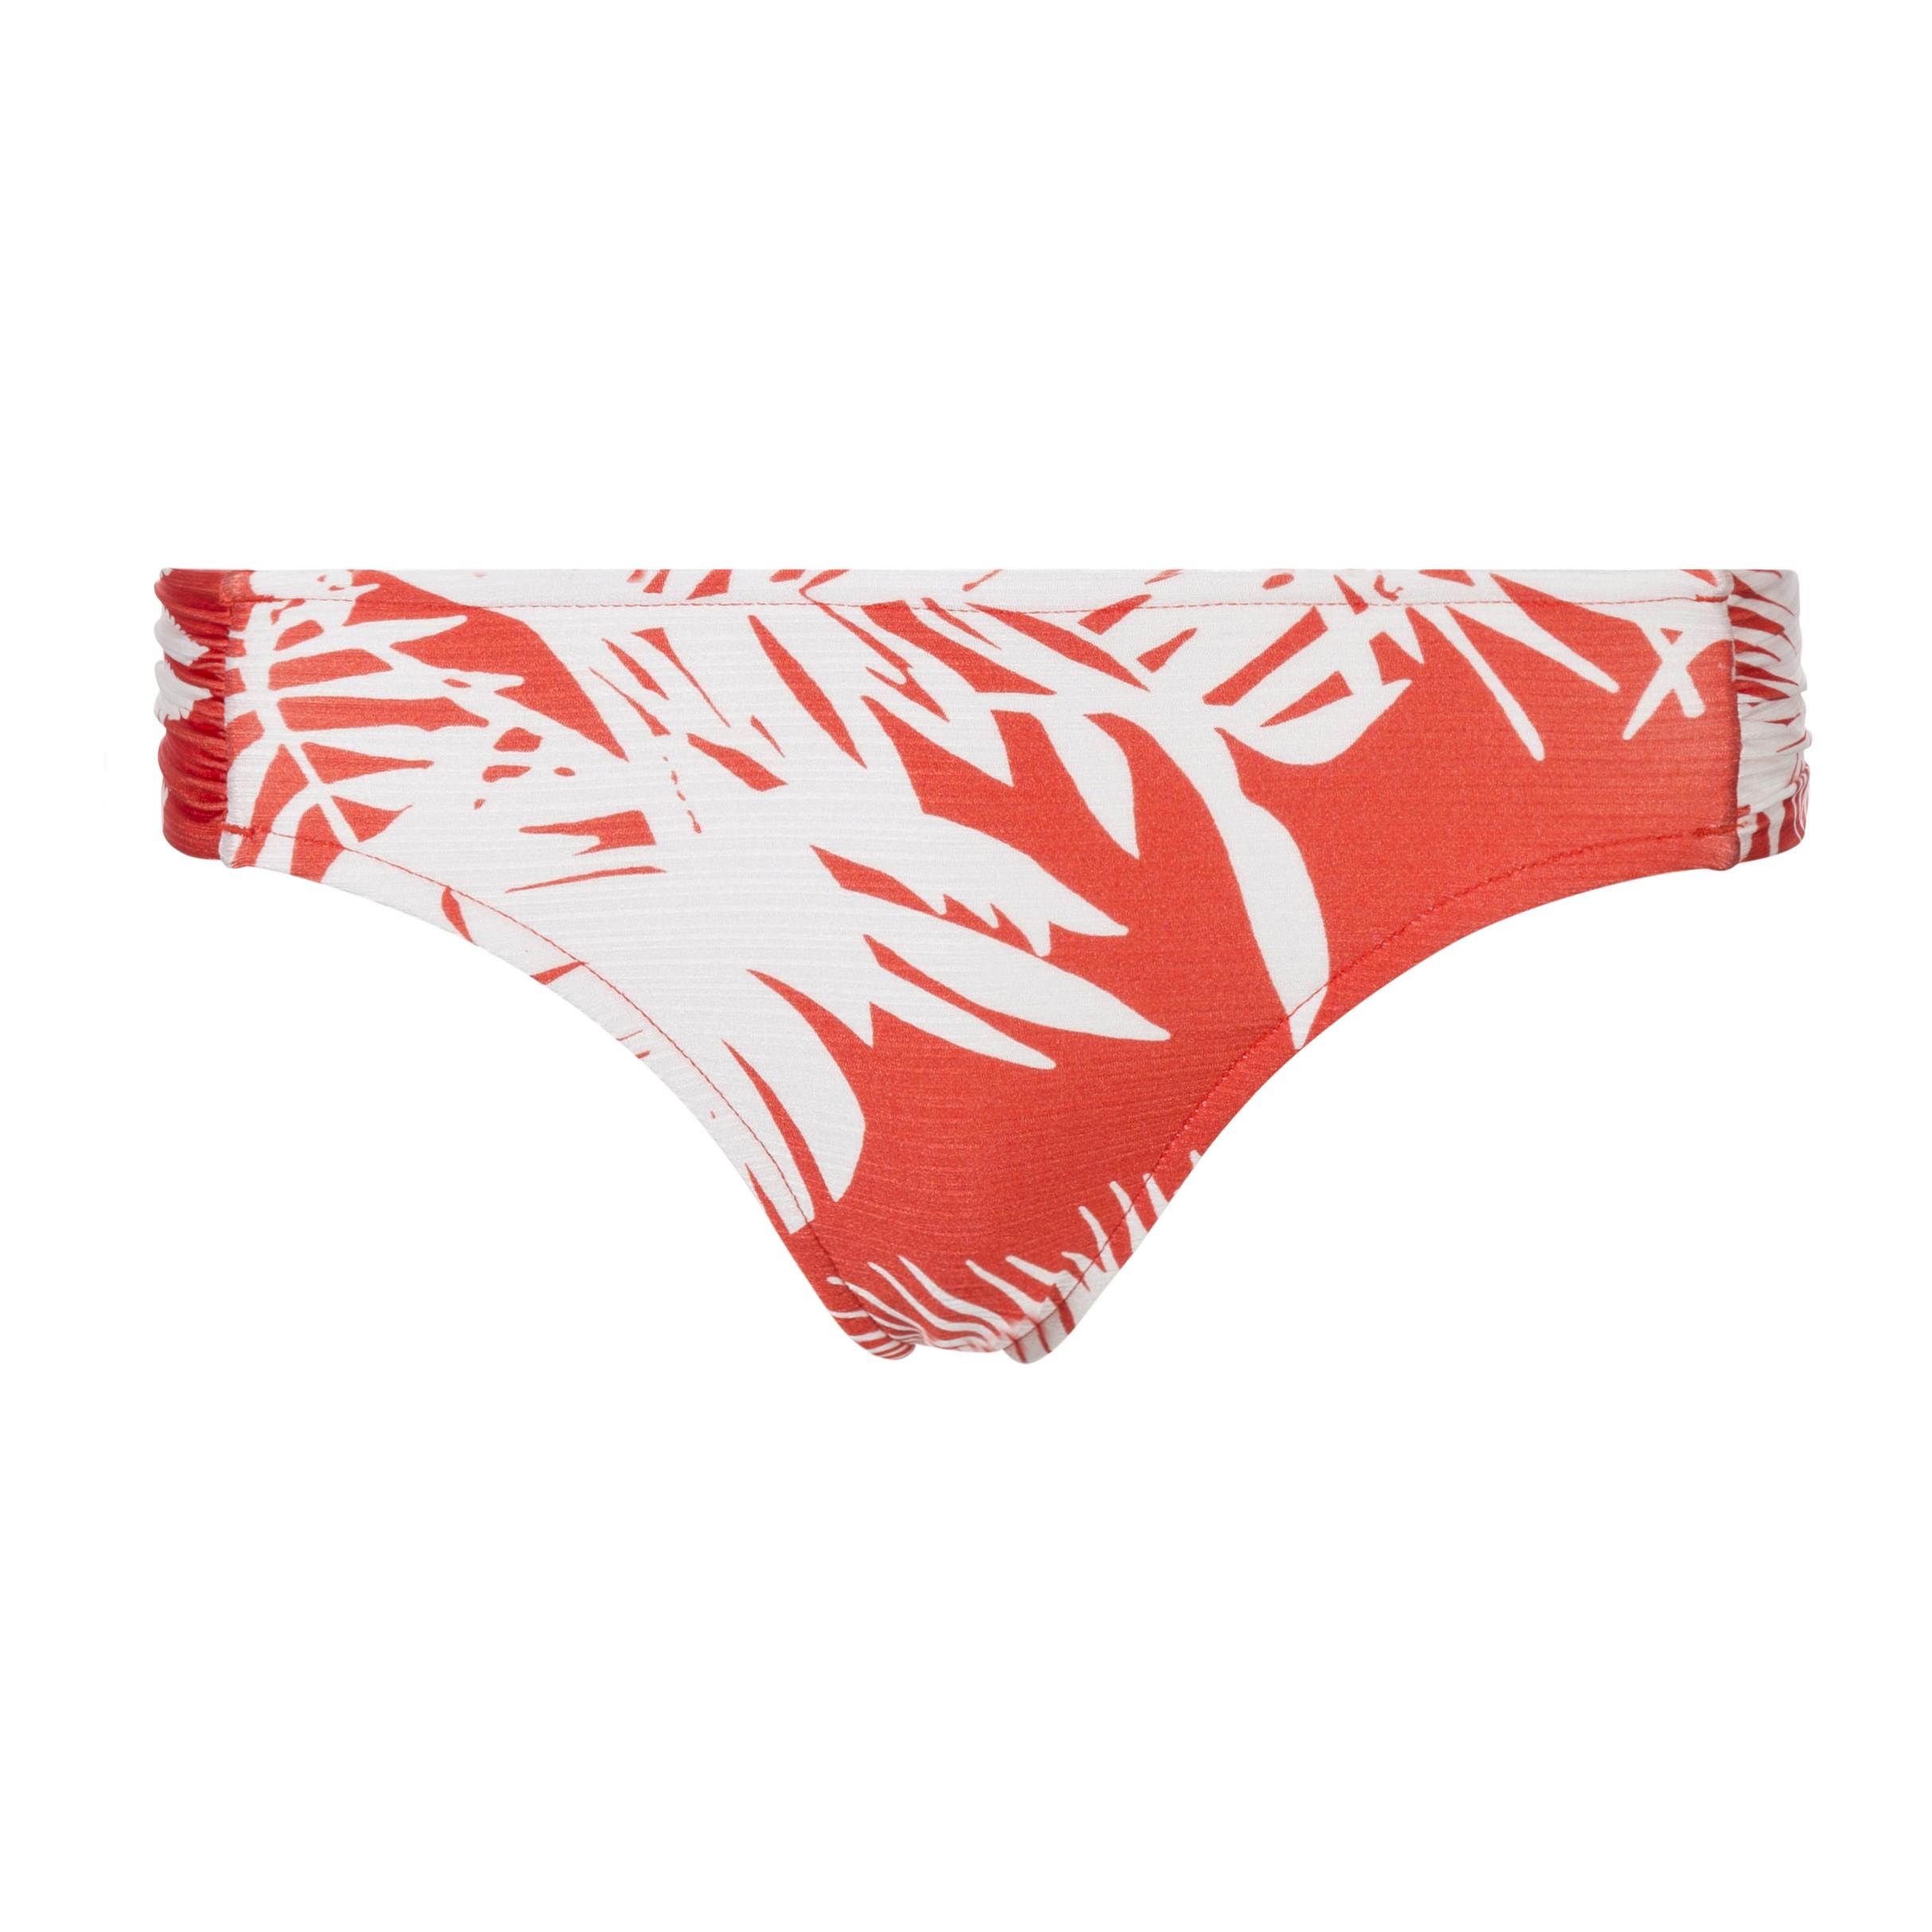 f5c5aa8ae1c2fe Two Piece Swimwear Two-coloured Tropical Balconette Swimsuit - Piquiri